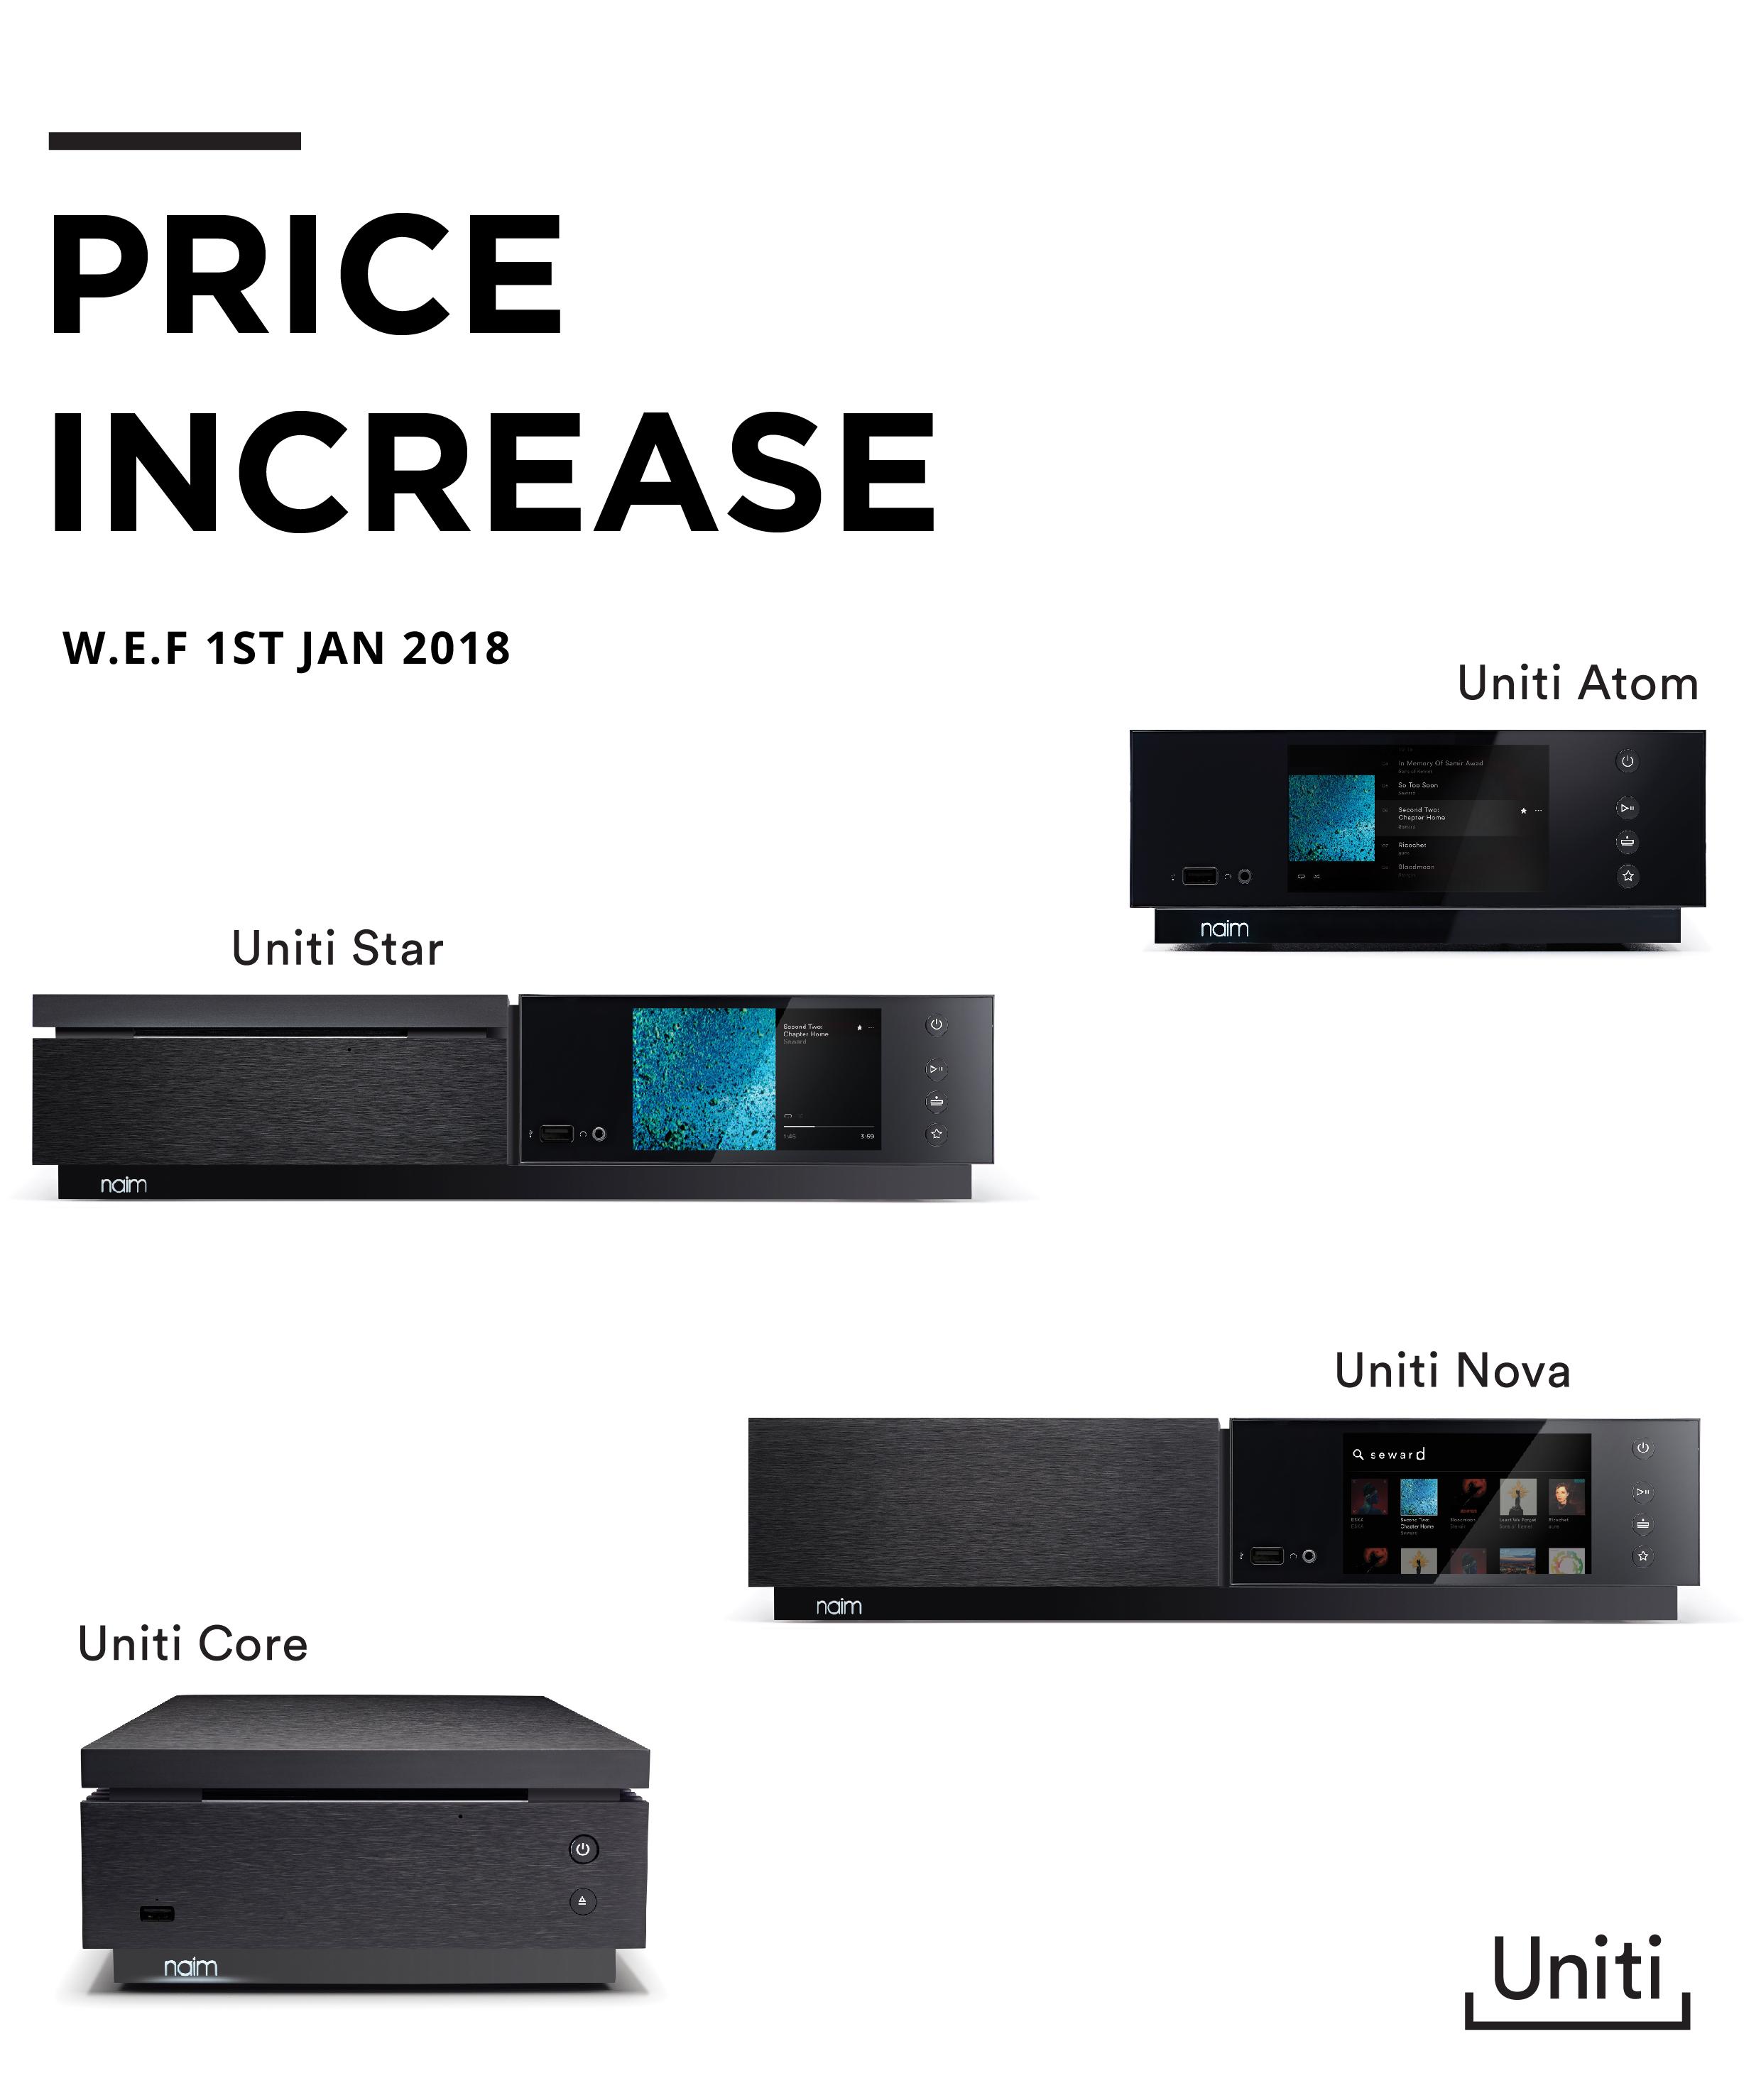 uniti price increase-01.jpg